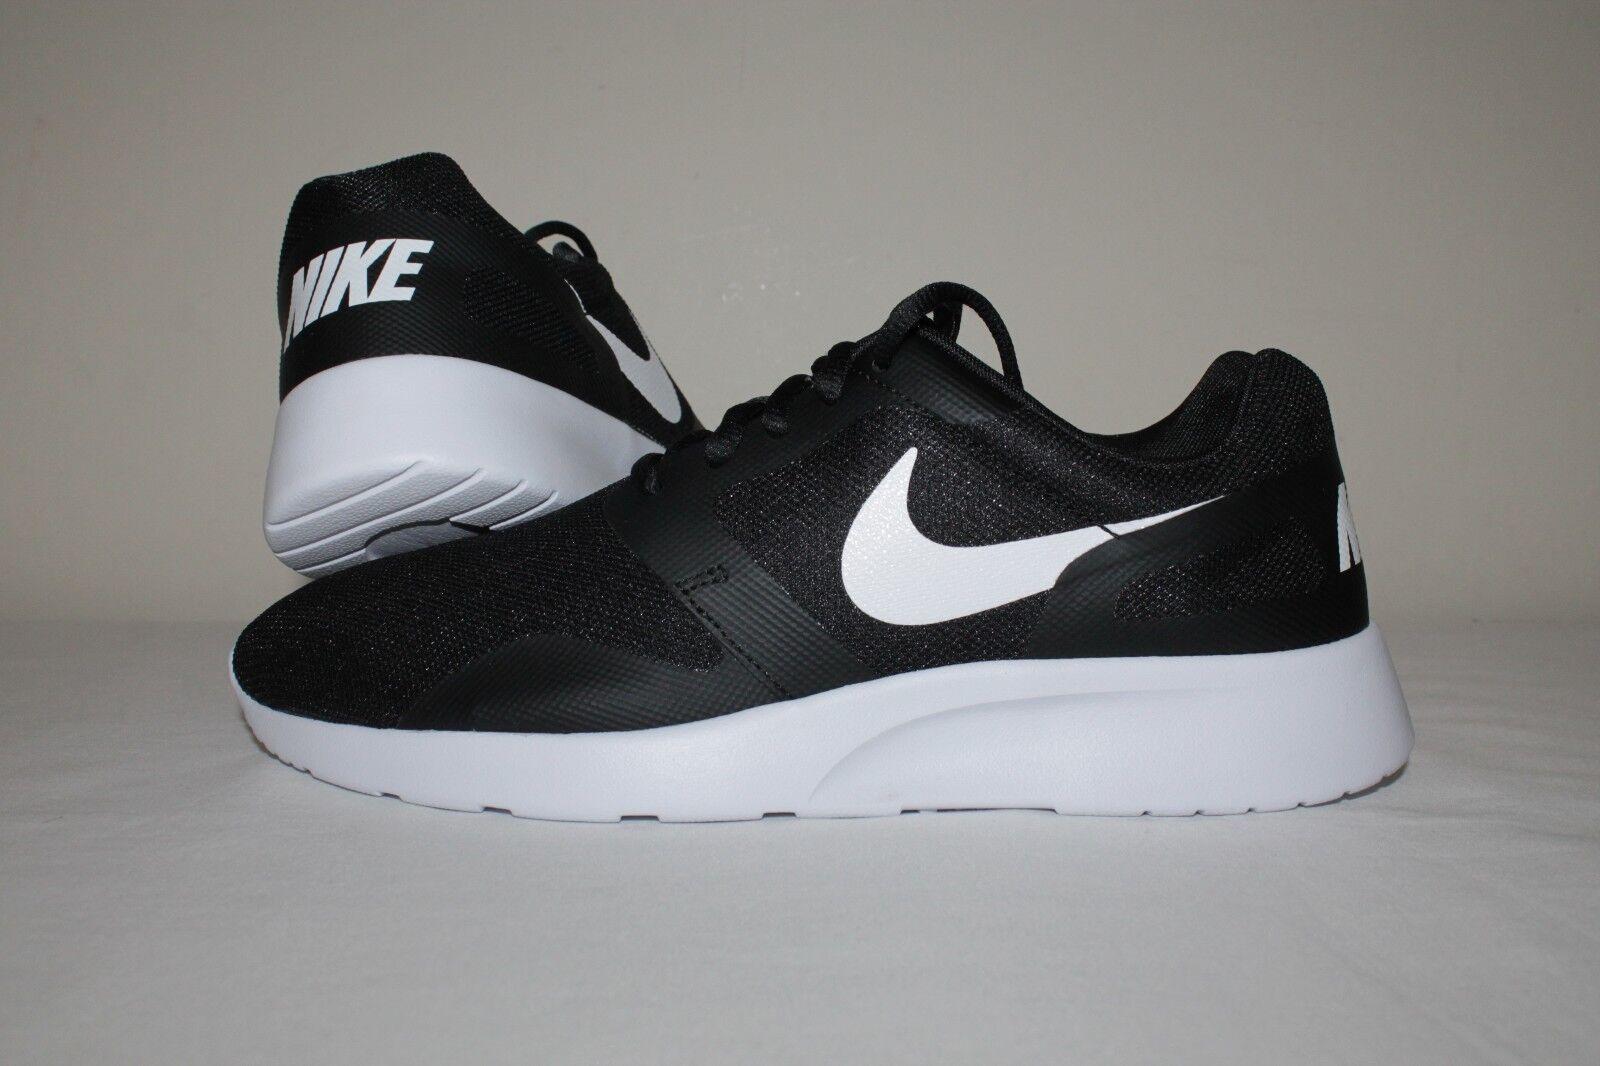 Nike Men Kaishi NS NS NS Turnschuhe Running schuhe new with box fc850e